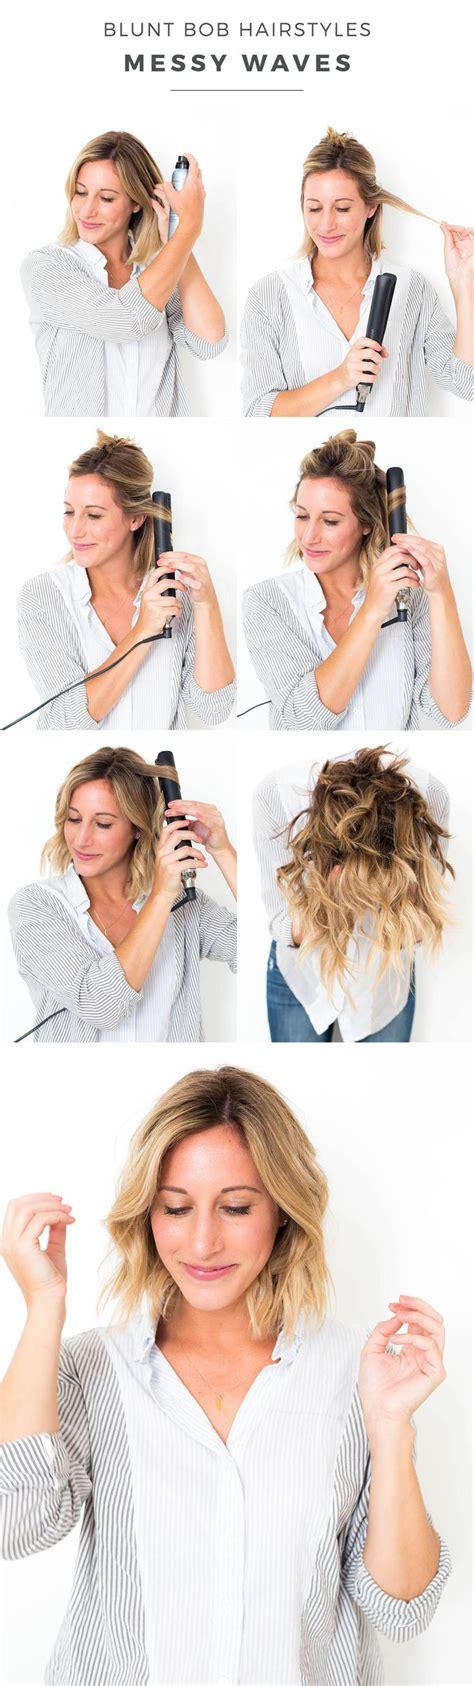 do short blunt curly haircuts look good on heavy women 220 ber 1 000 ideen zu gewellte bobs auf pinterest bobs